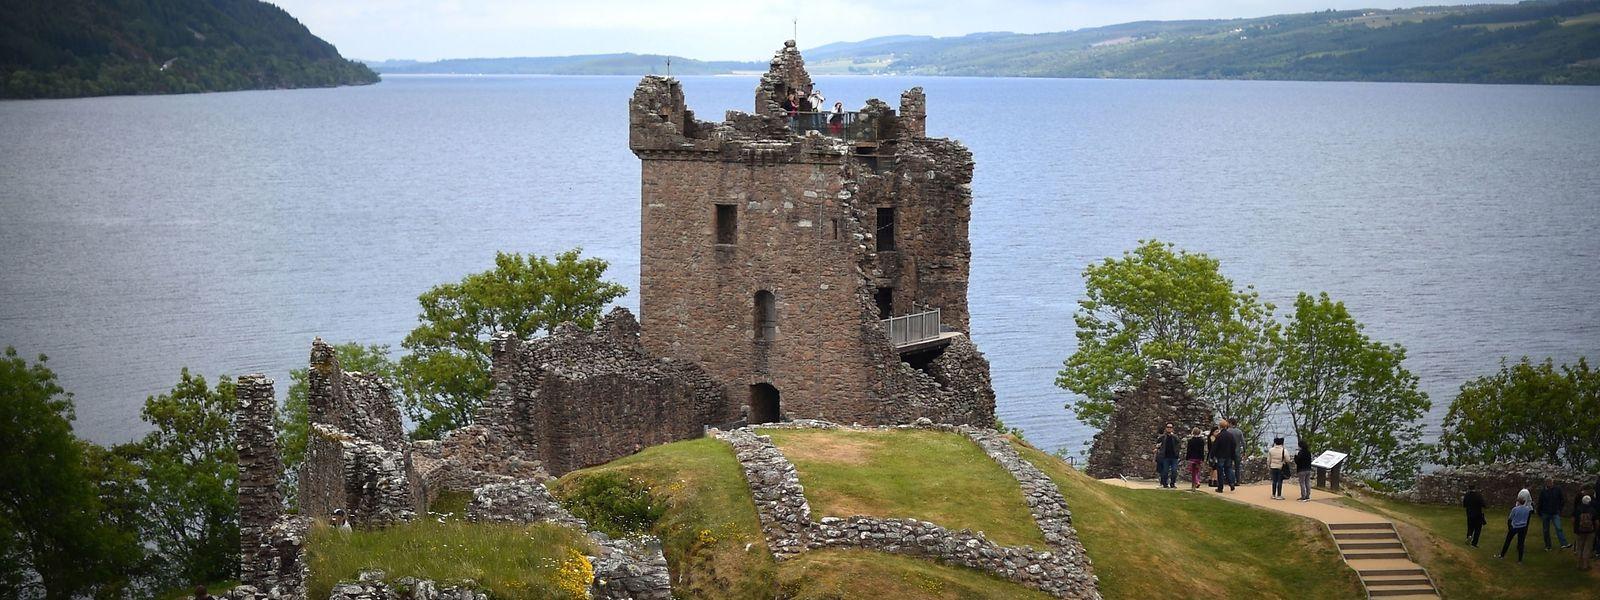 Das Schloss Urquhart Castle am Ufer von Loch Ness.